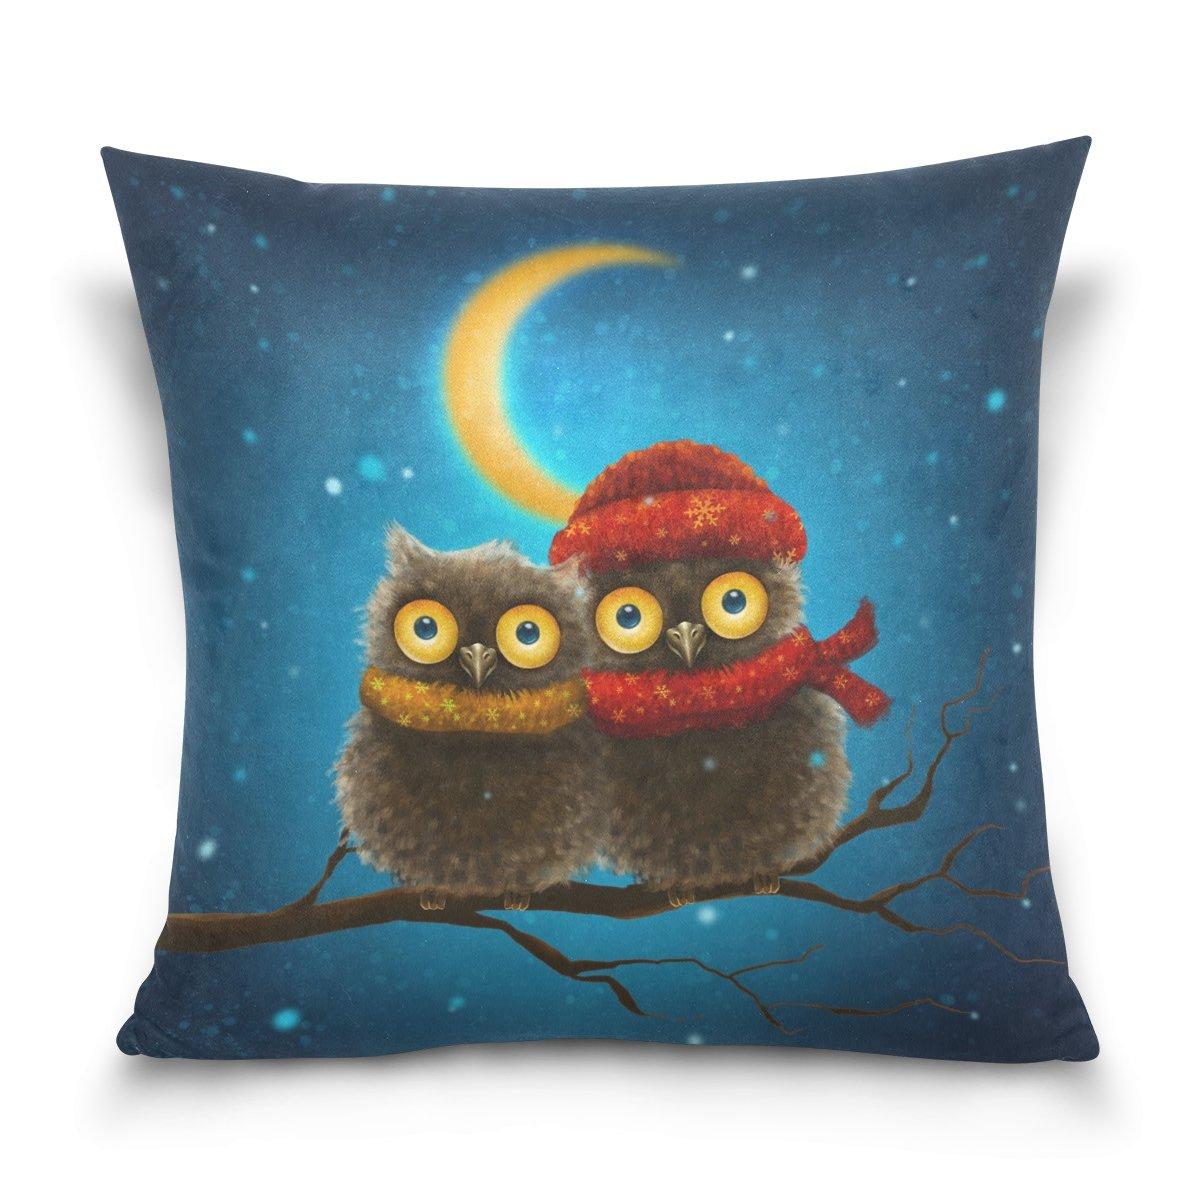 (18x18, Multicolour-owl) - Double Sided Little Snow Owls Blue Sky Moon Star and Snowflakes Cotton Velvet Throw Pillow 46cm x 46cm Zipper Pillowcase for Decorative Pillows B075H1PGFP 18x18 Multicolour-owl Multicolour-owl 18x18